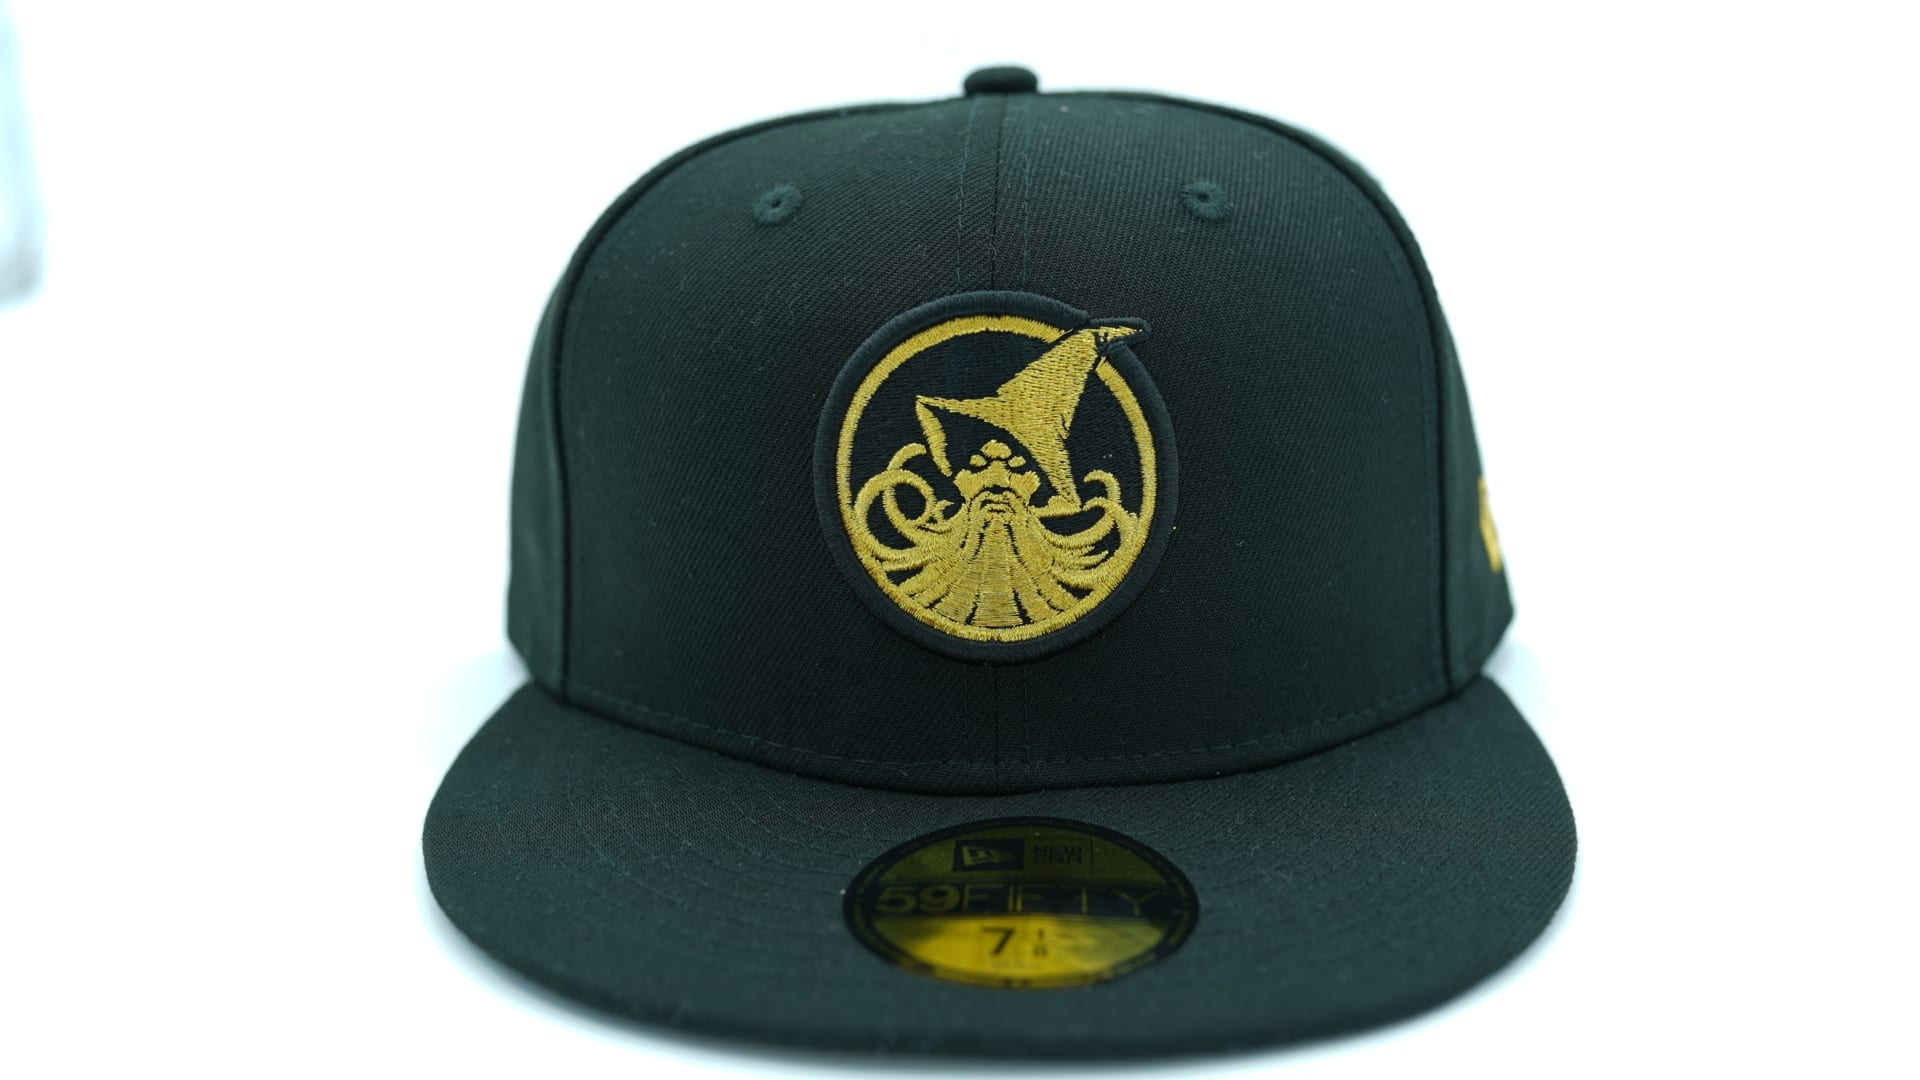 0e4f5cd40a5cdf ... ireland new era 59fifty fitted baseball cap hat 17f51 60f59